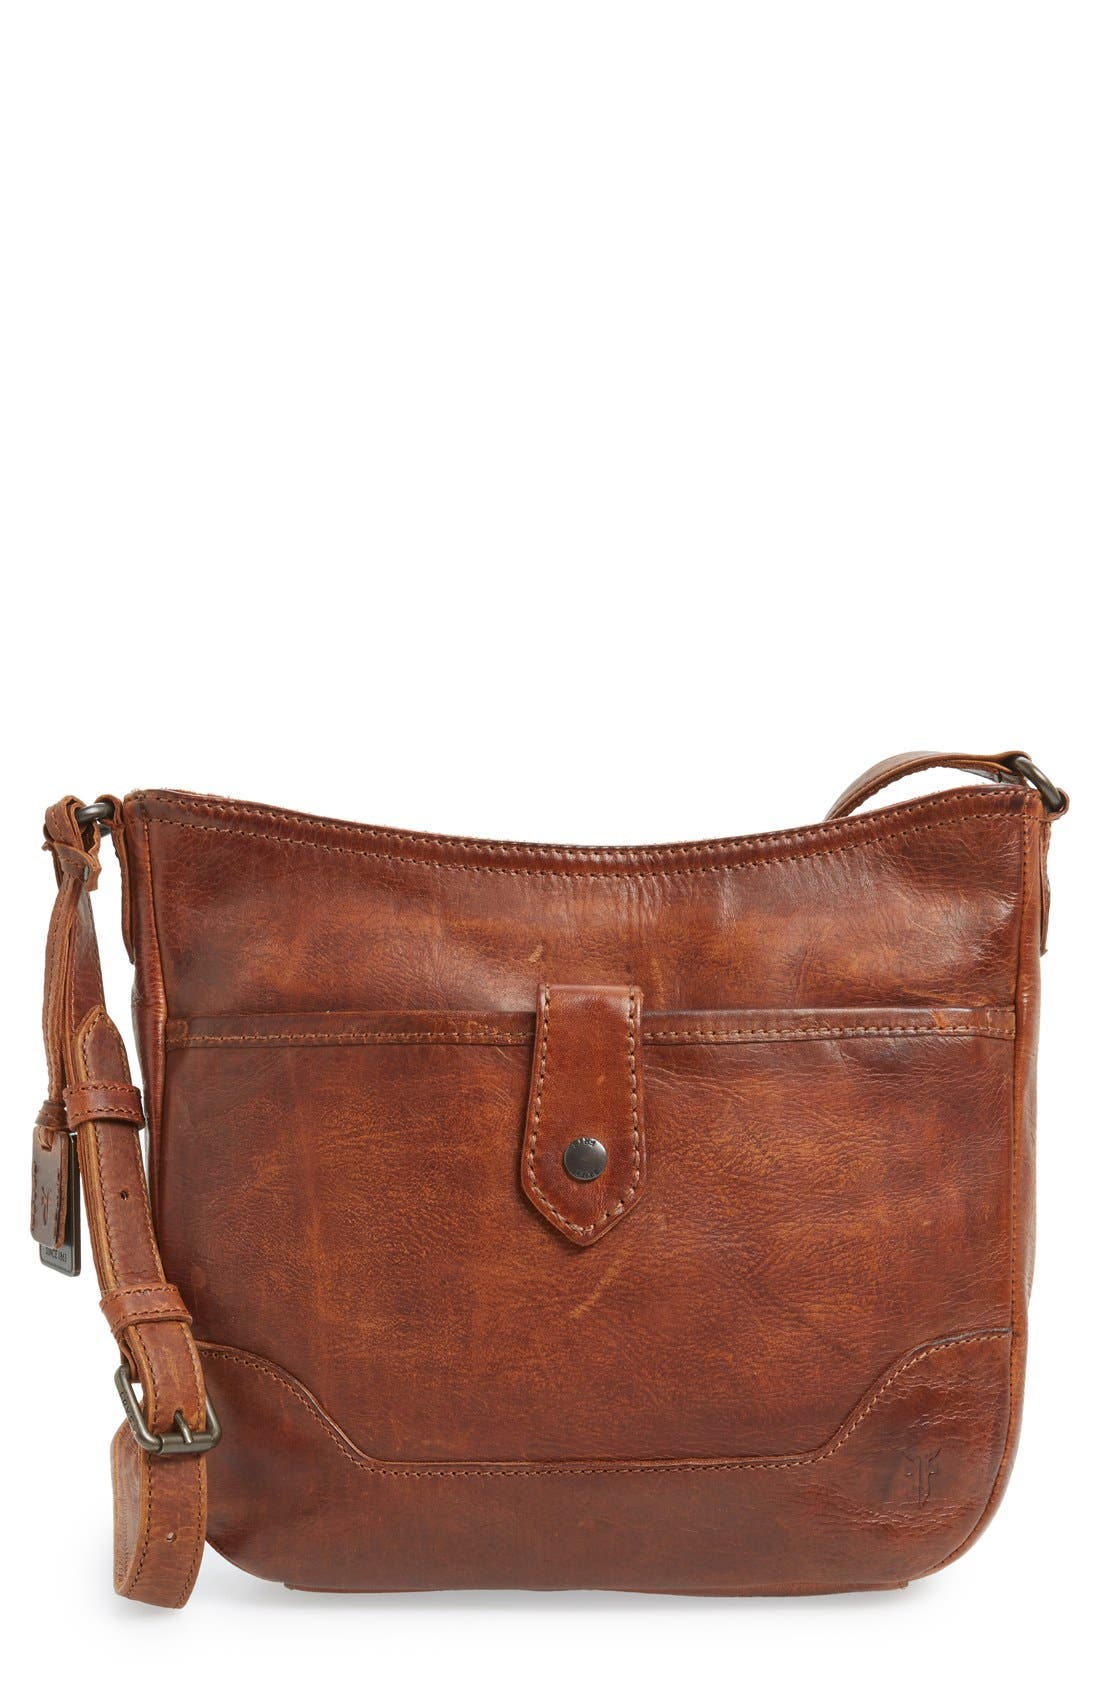 Melissa Button Crossbody Bag,                             Main thumbnail 1, color,                             Cognac